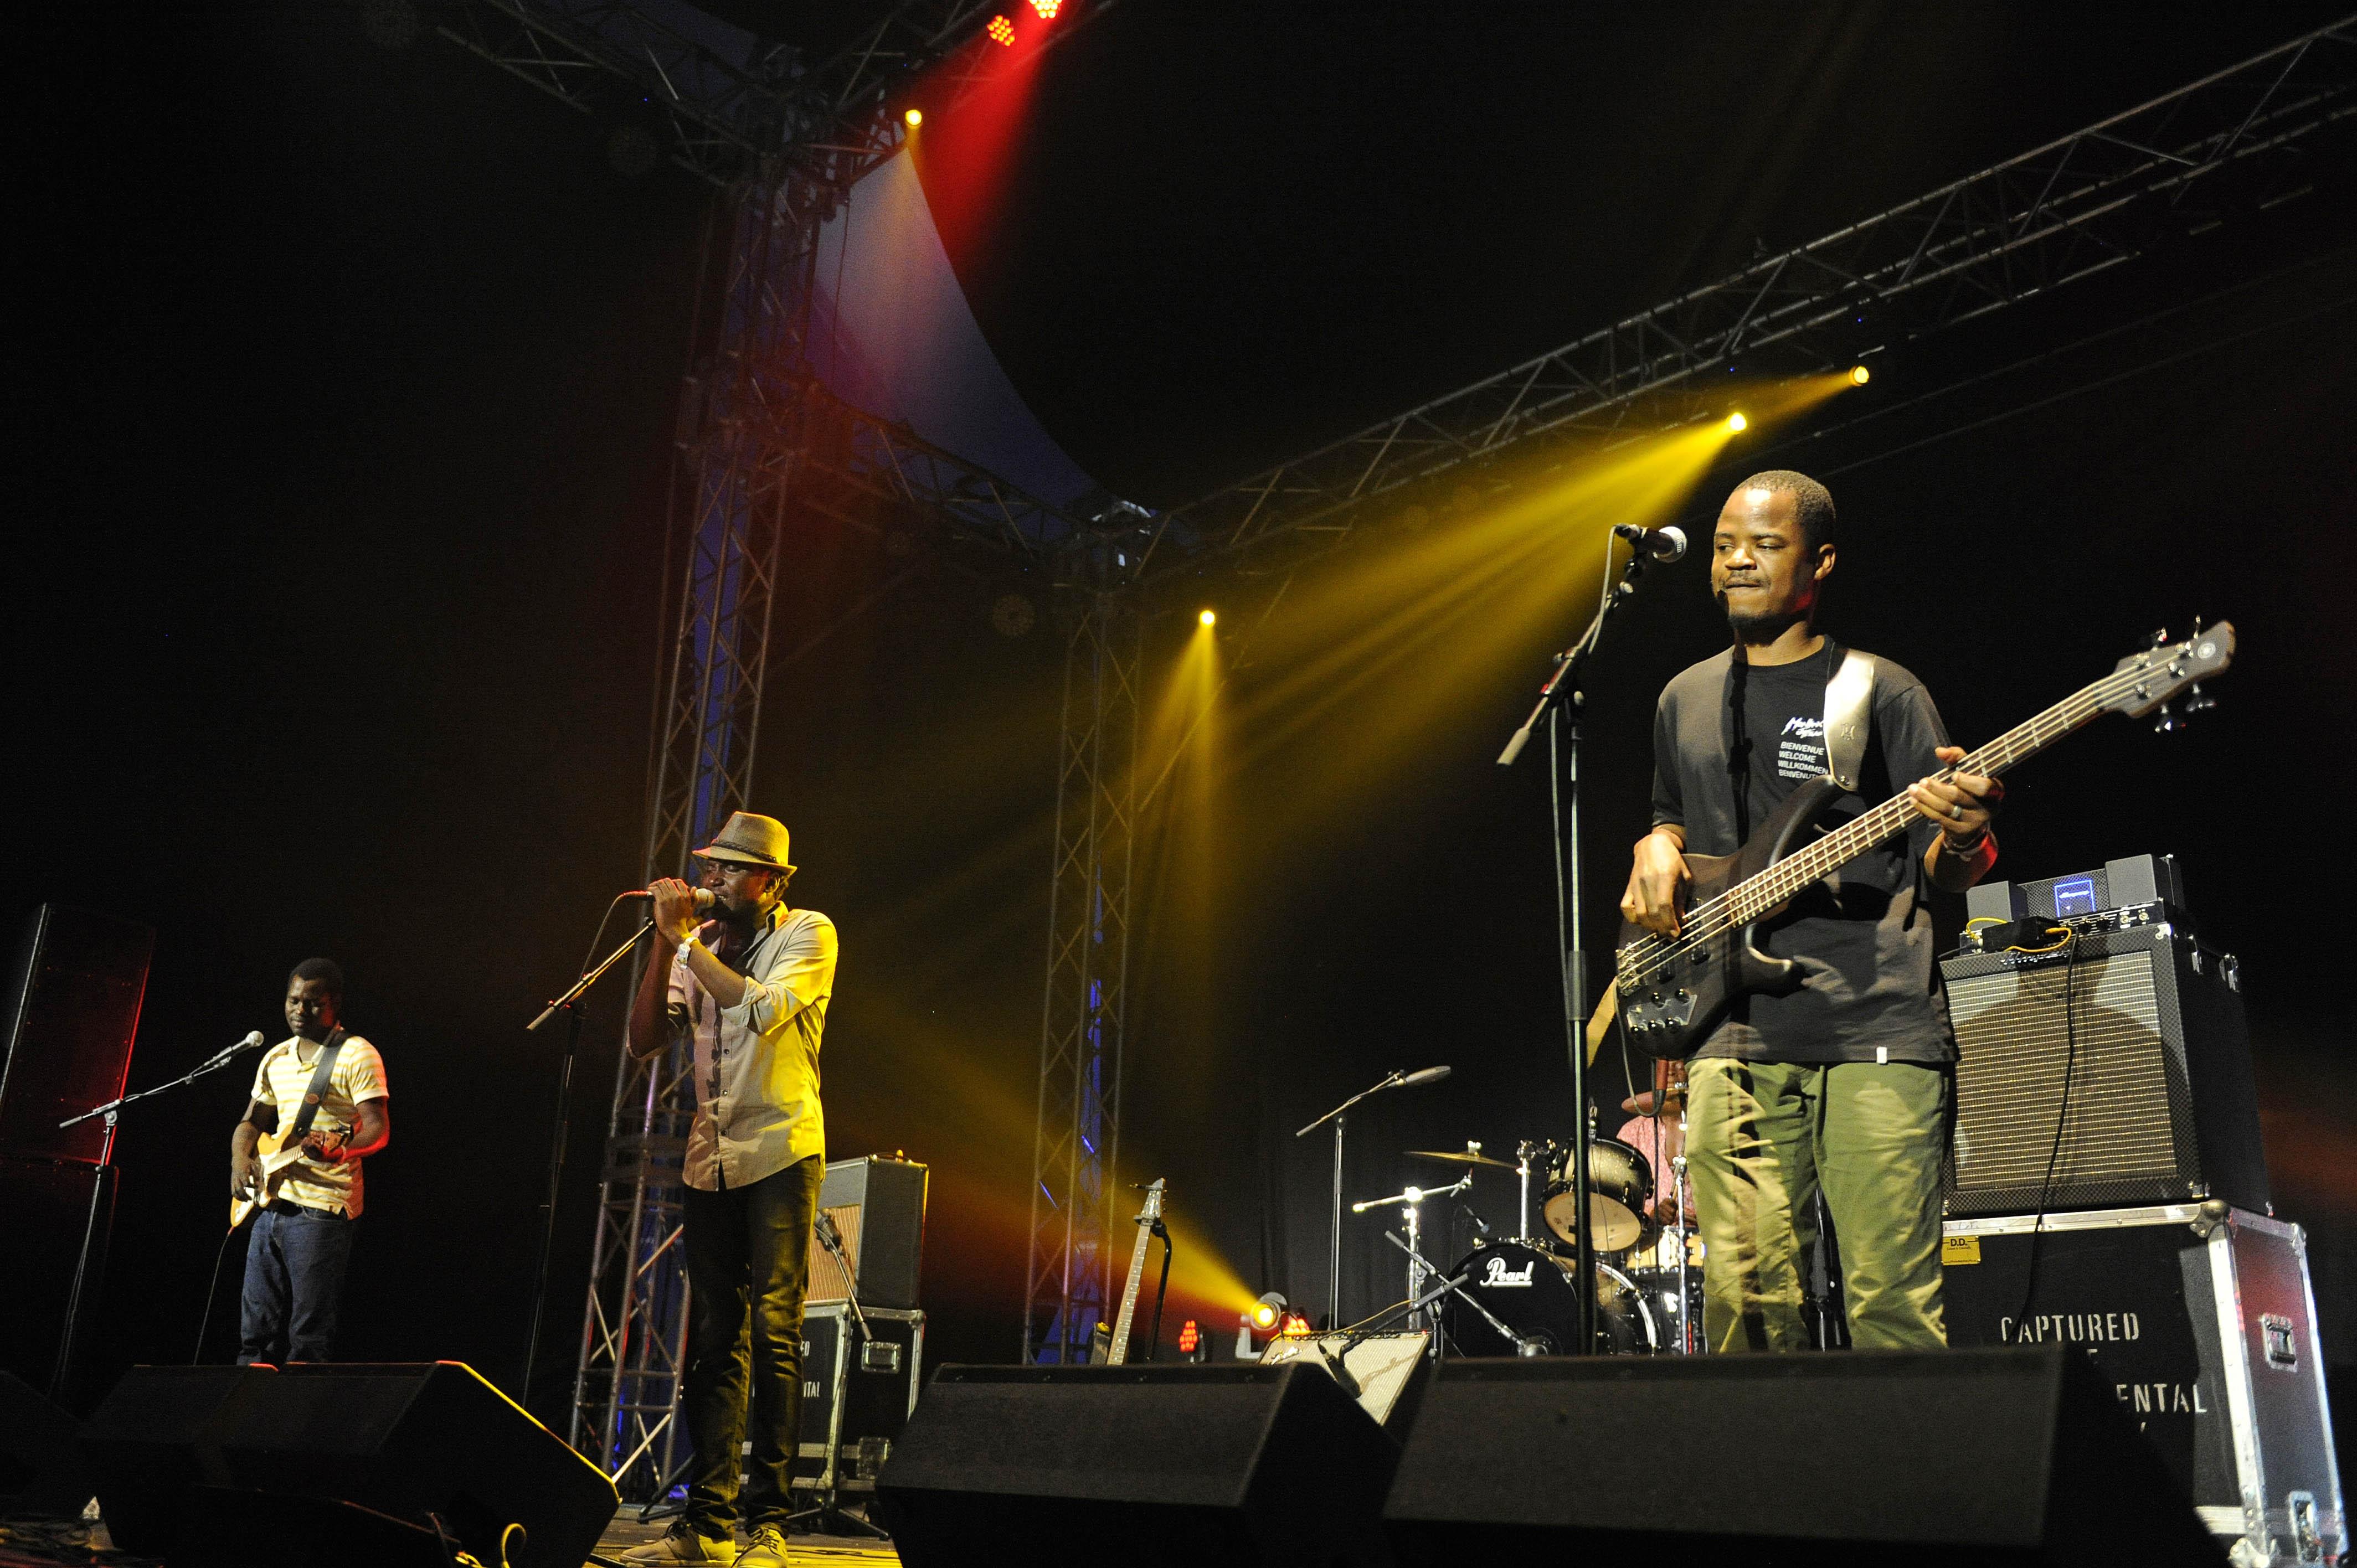 Songhoy Blues - die Blues Band aus Mali live beim A Summer´s Tale Open Air Festival 2015: Premiere des Festivals in der Lu